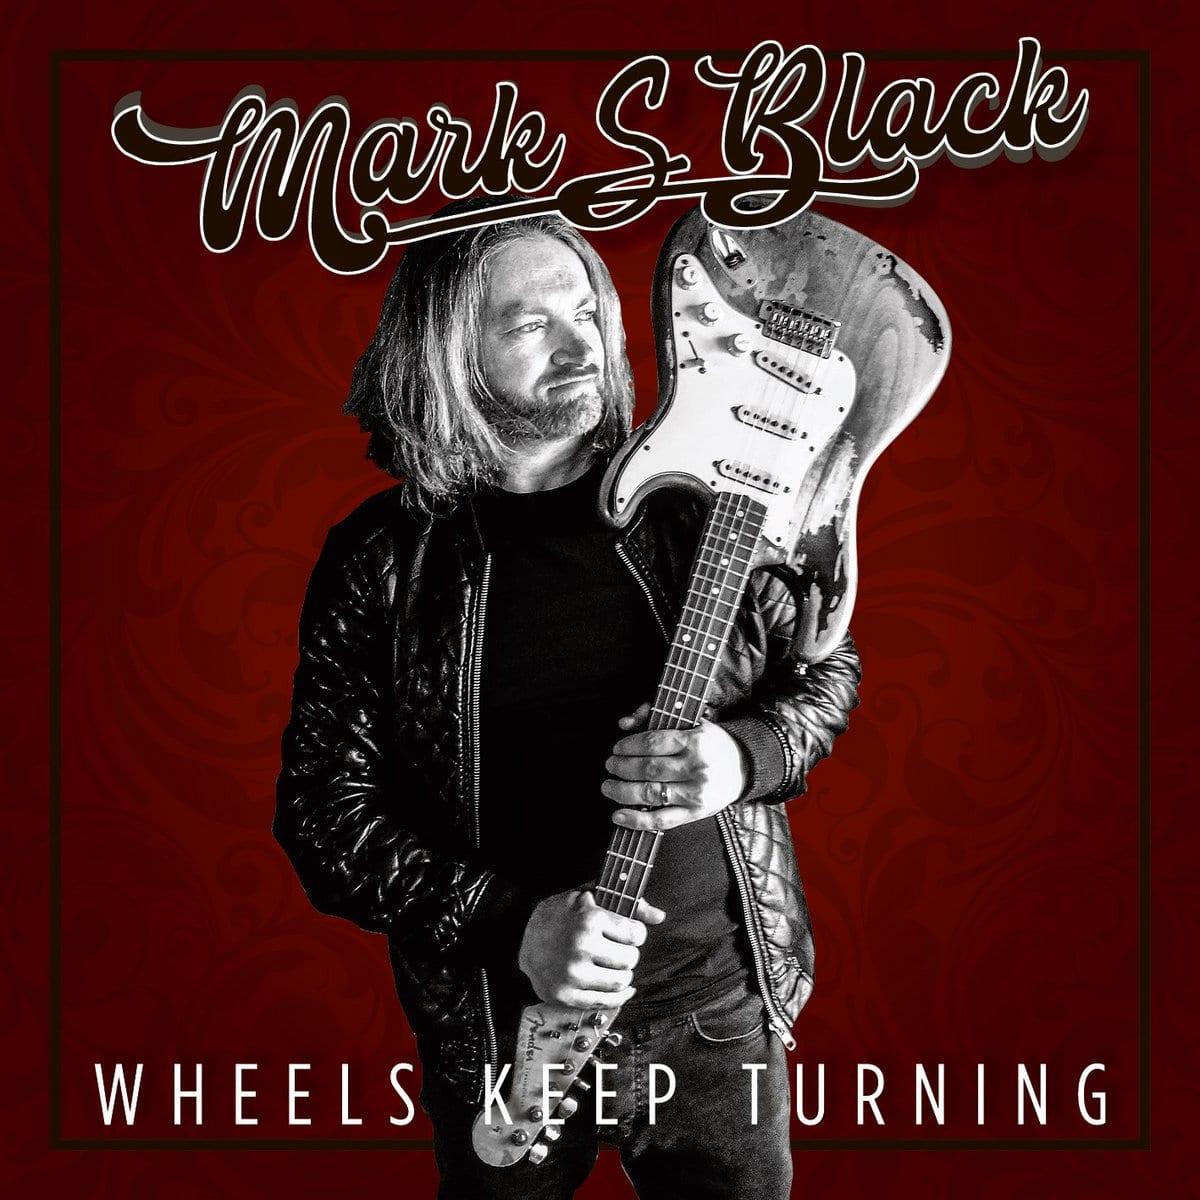 Mark Black Wheels keep turning